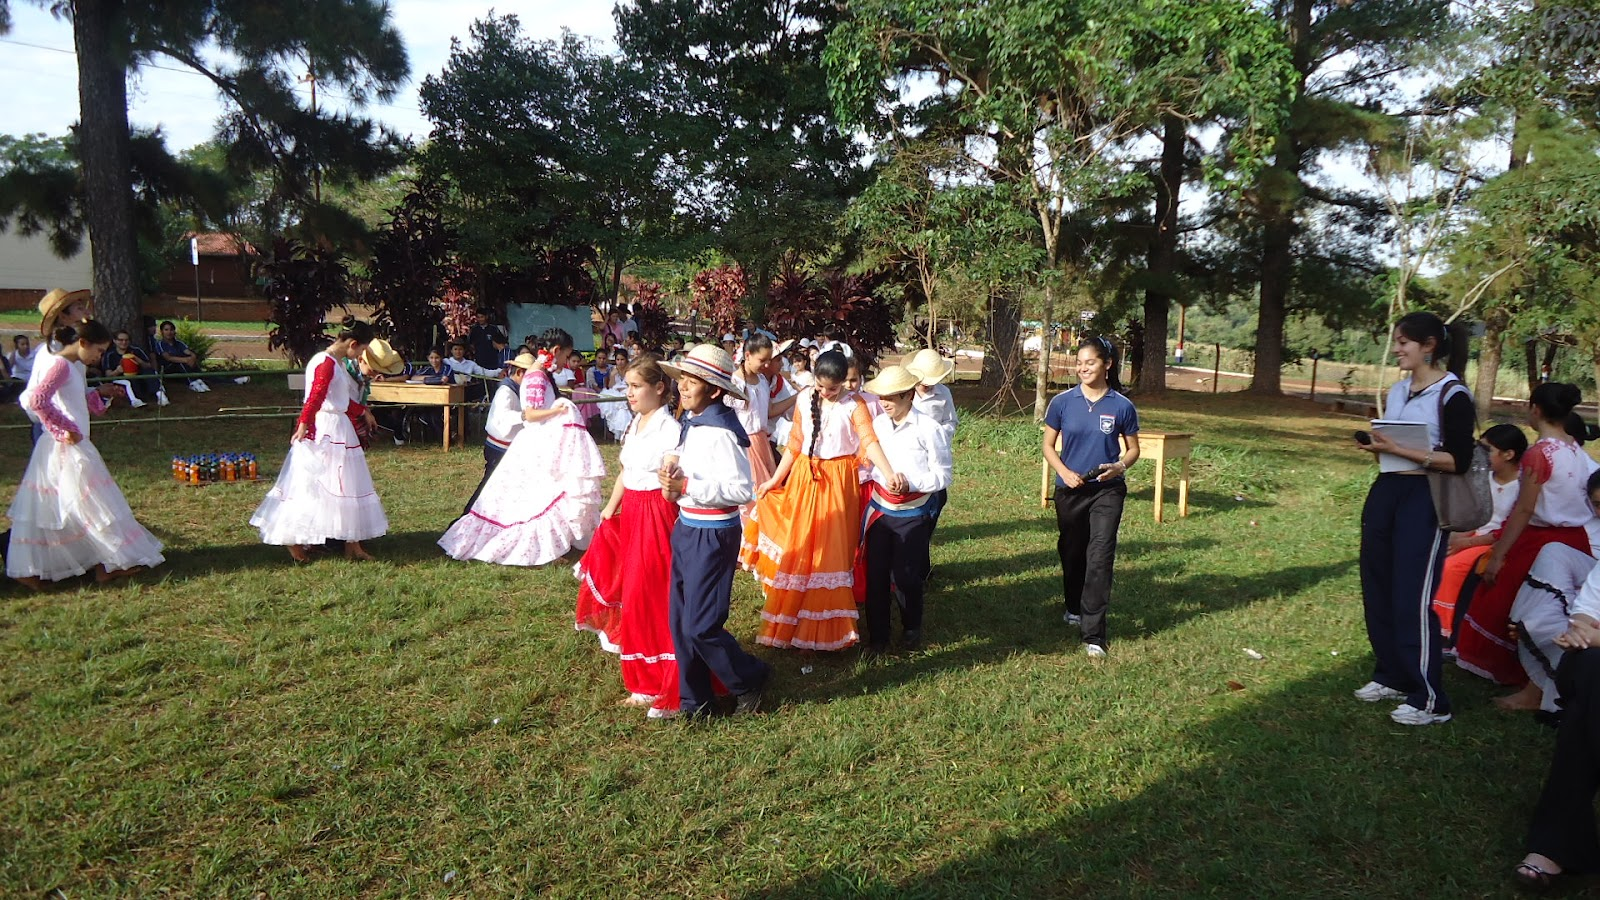 Durante la víspera de San Juan Ára se realizan múltiples actividades populares.